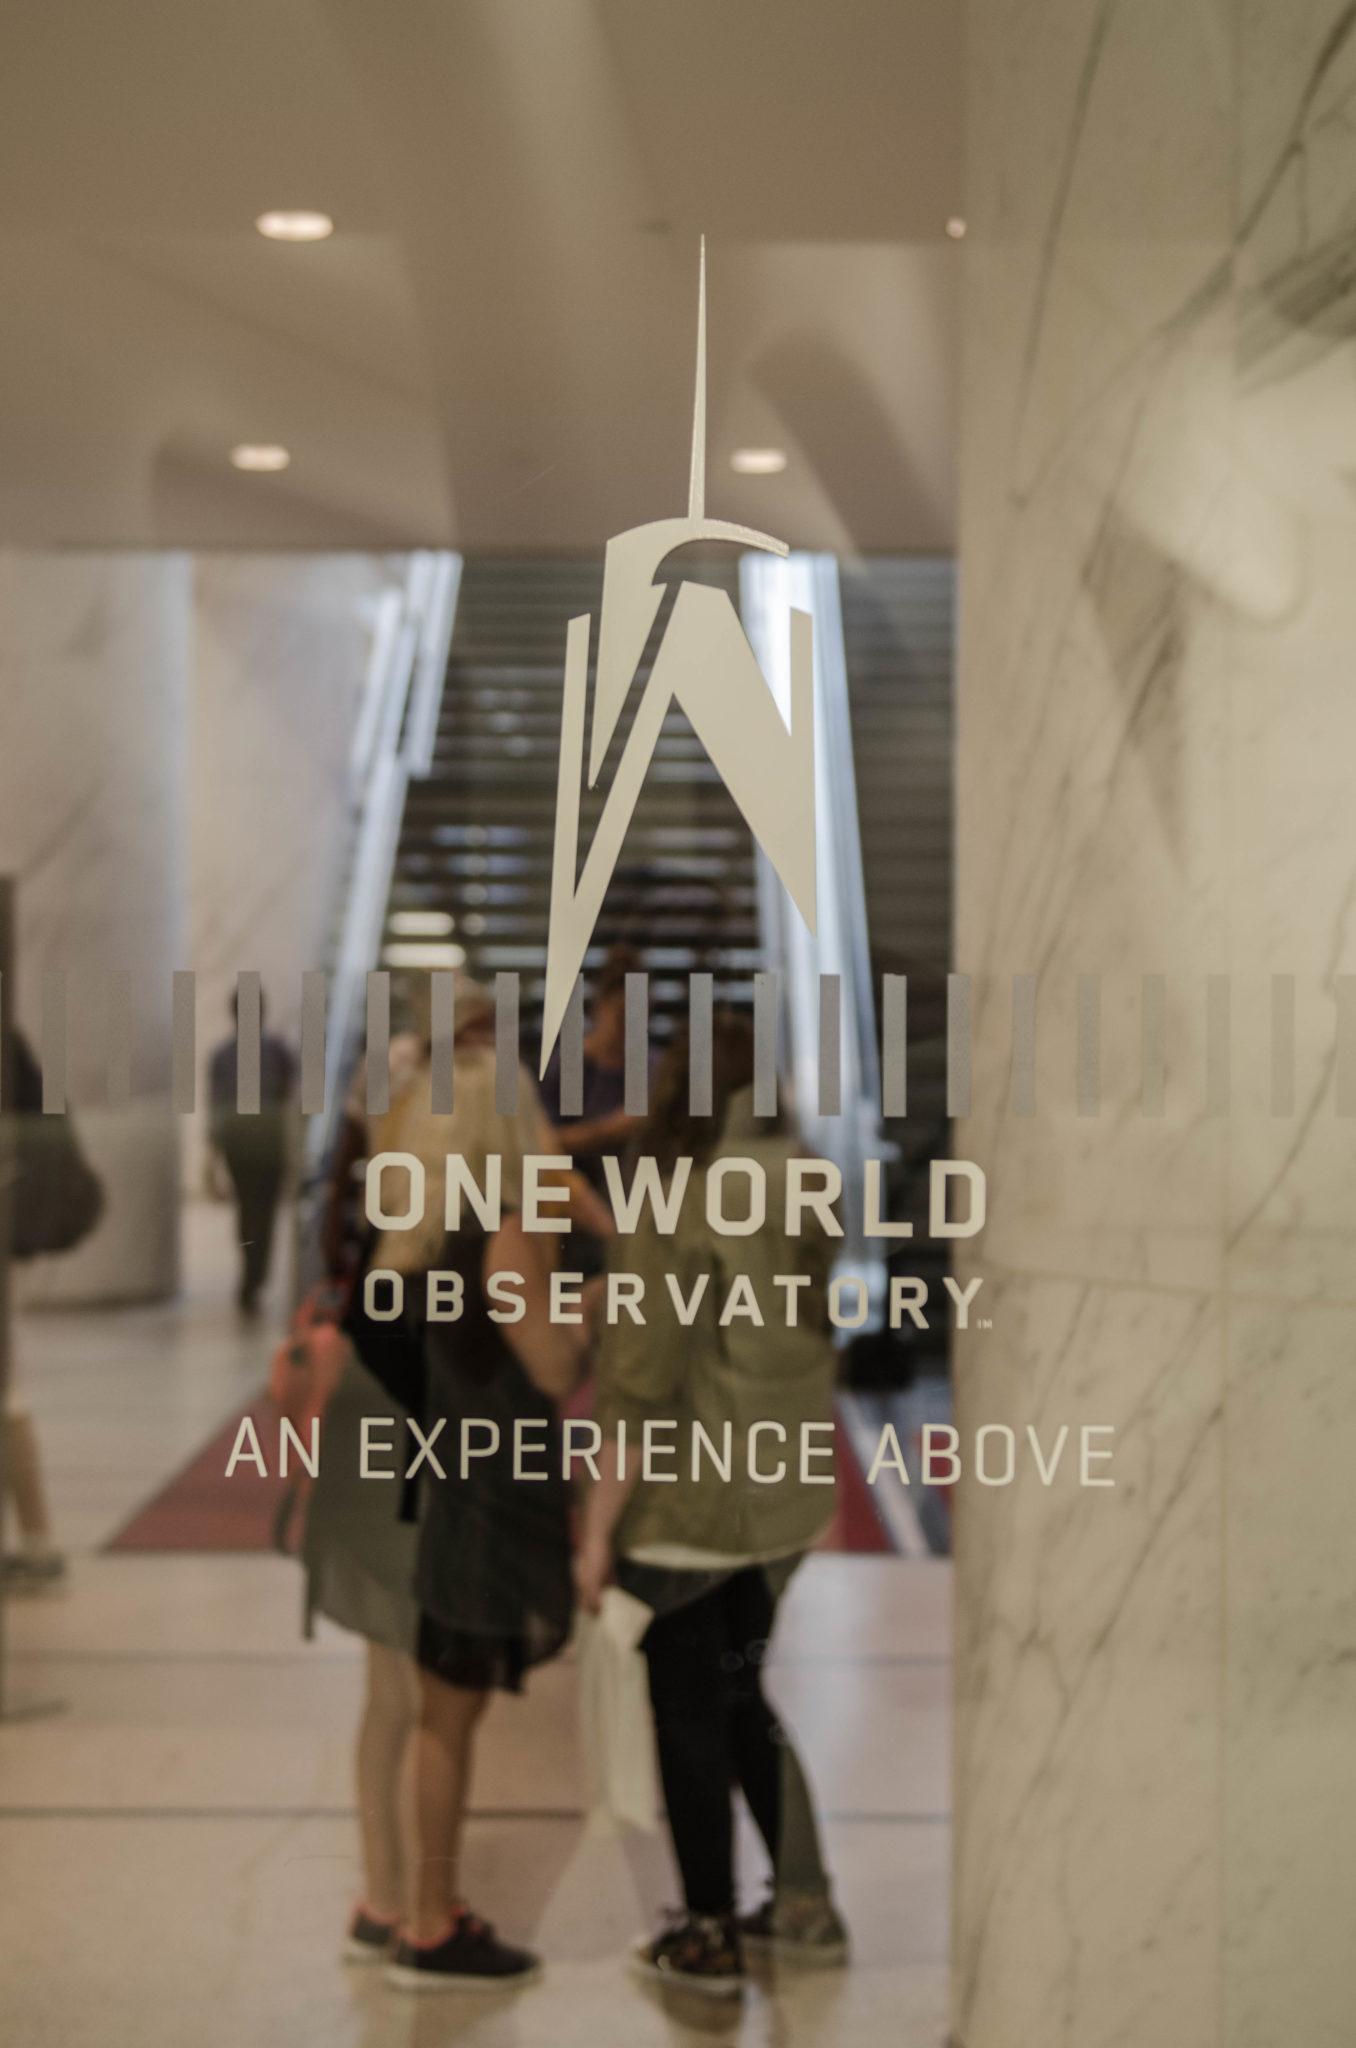 Eingang zum One World Observatory